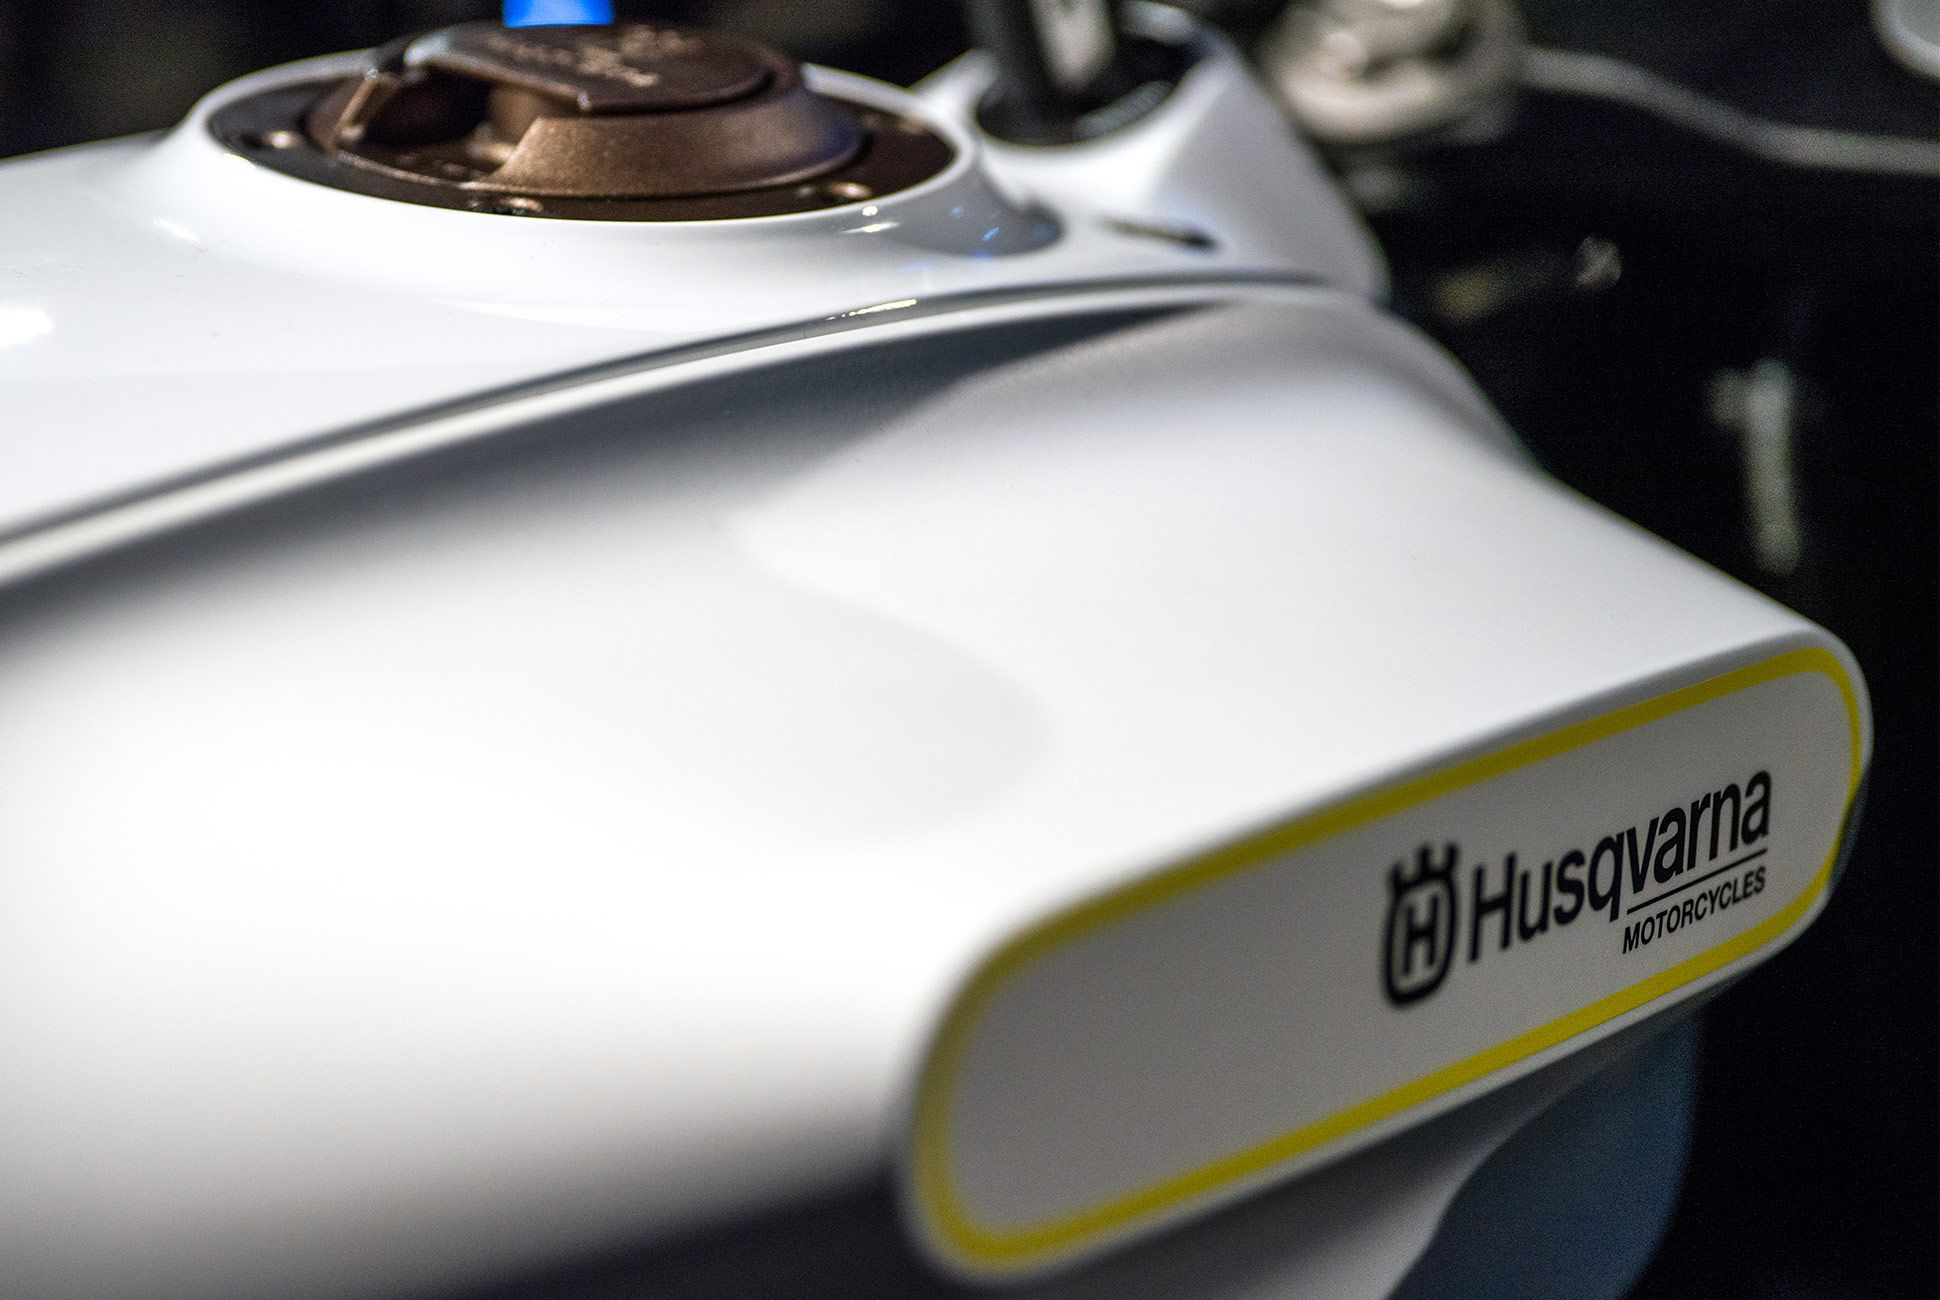 Husqvarna-Motorcycle-gear-patrol-4